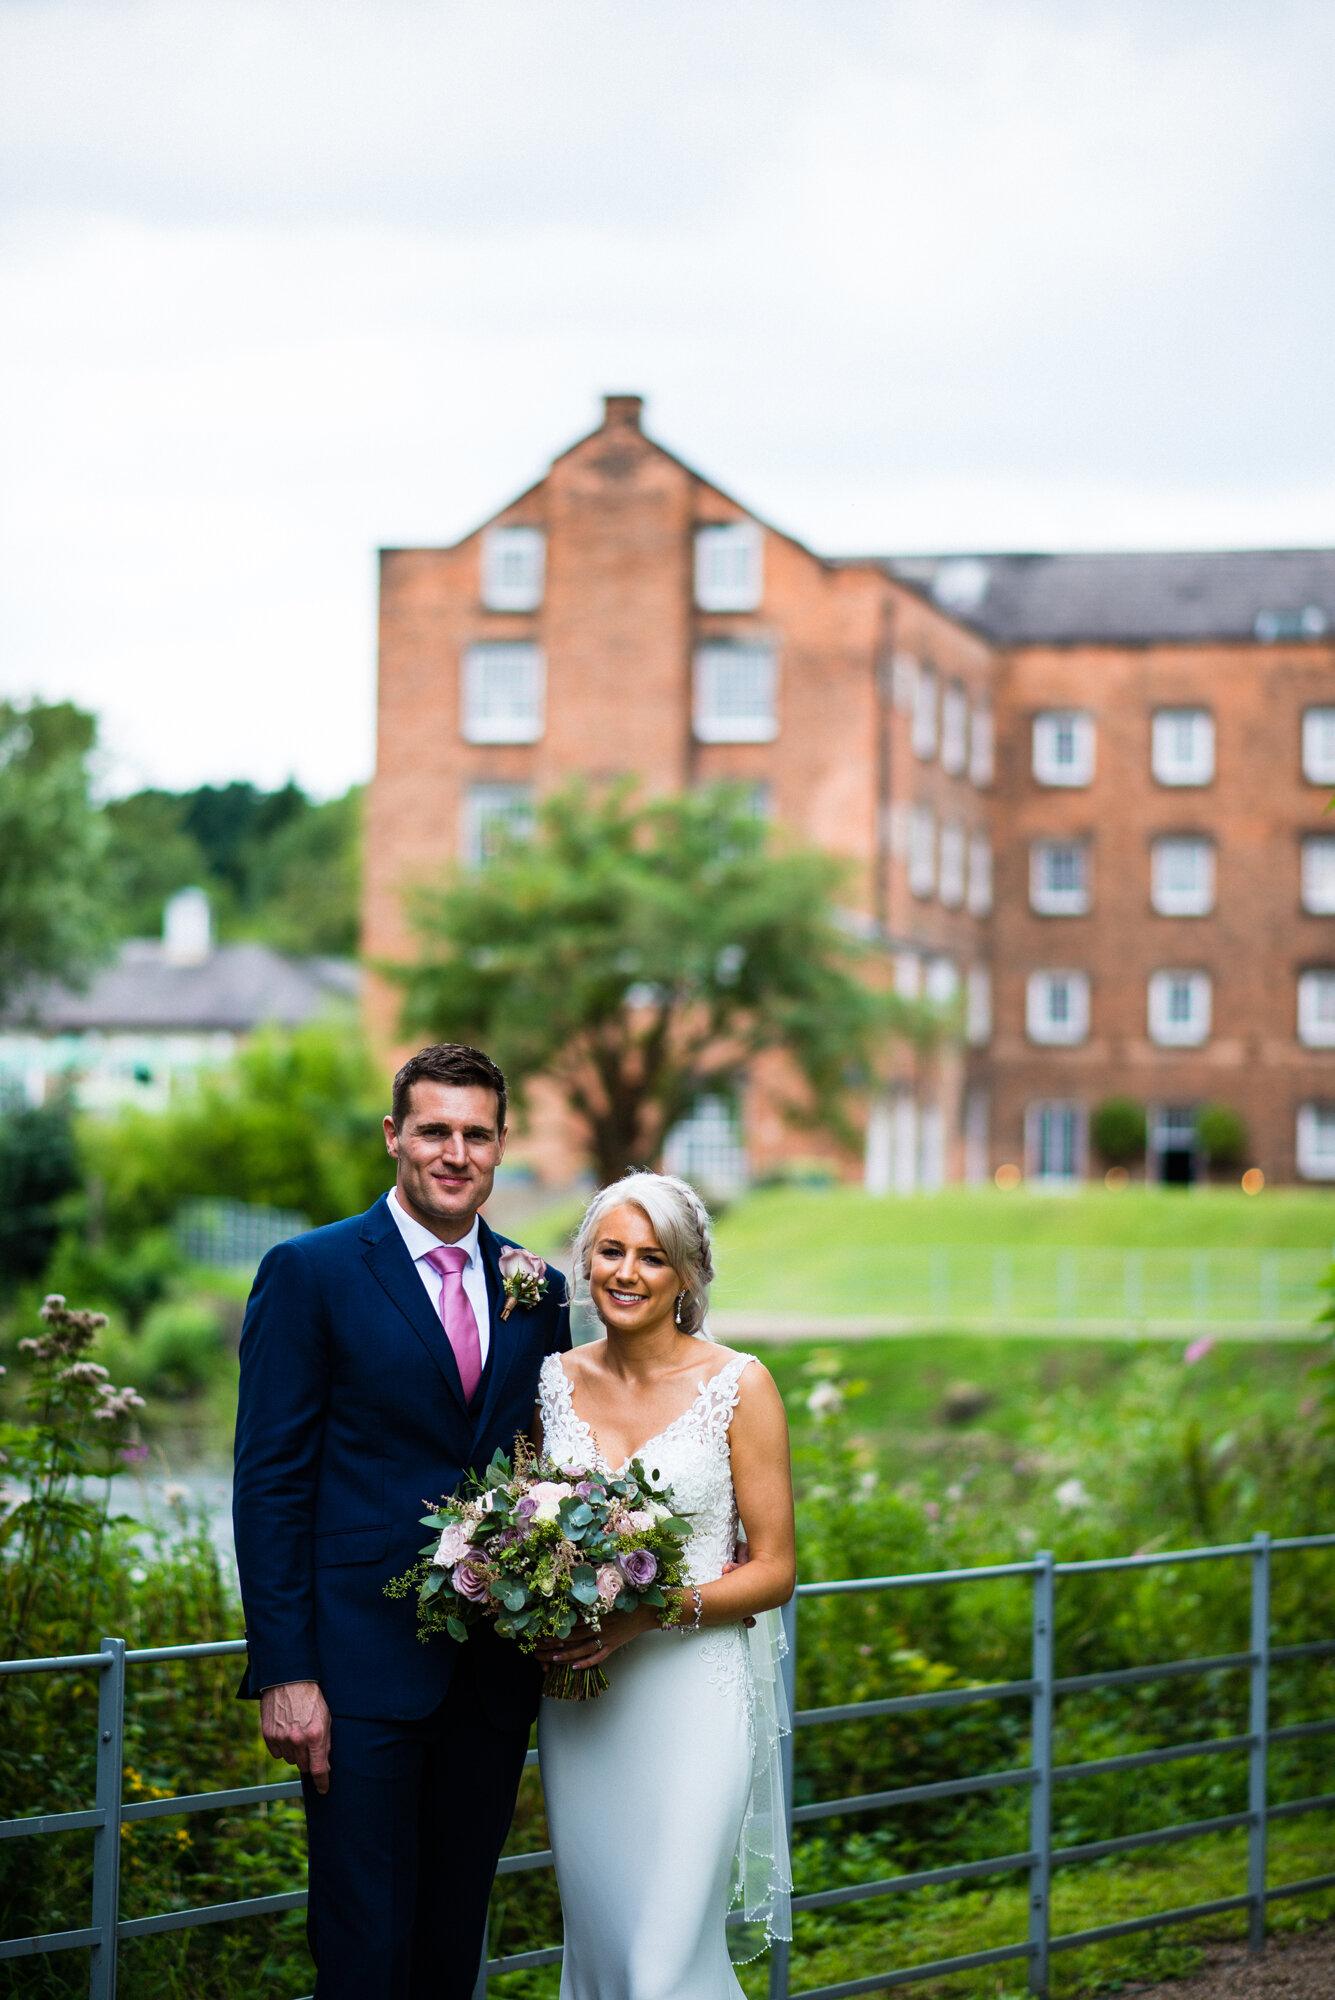 West Mills wedding venue 37.jpg